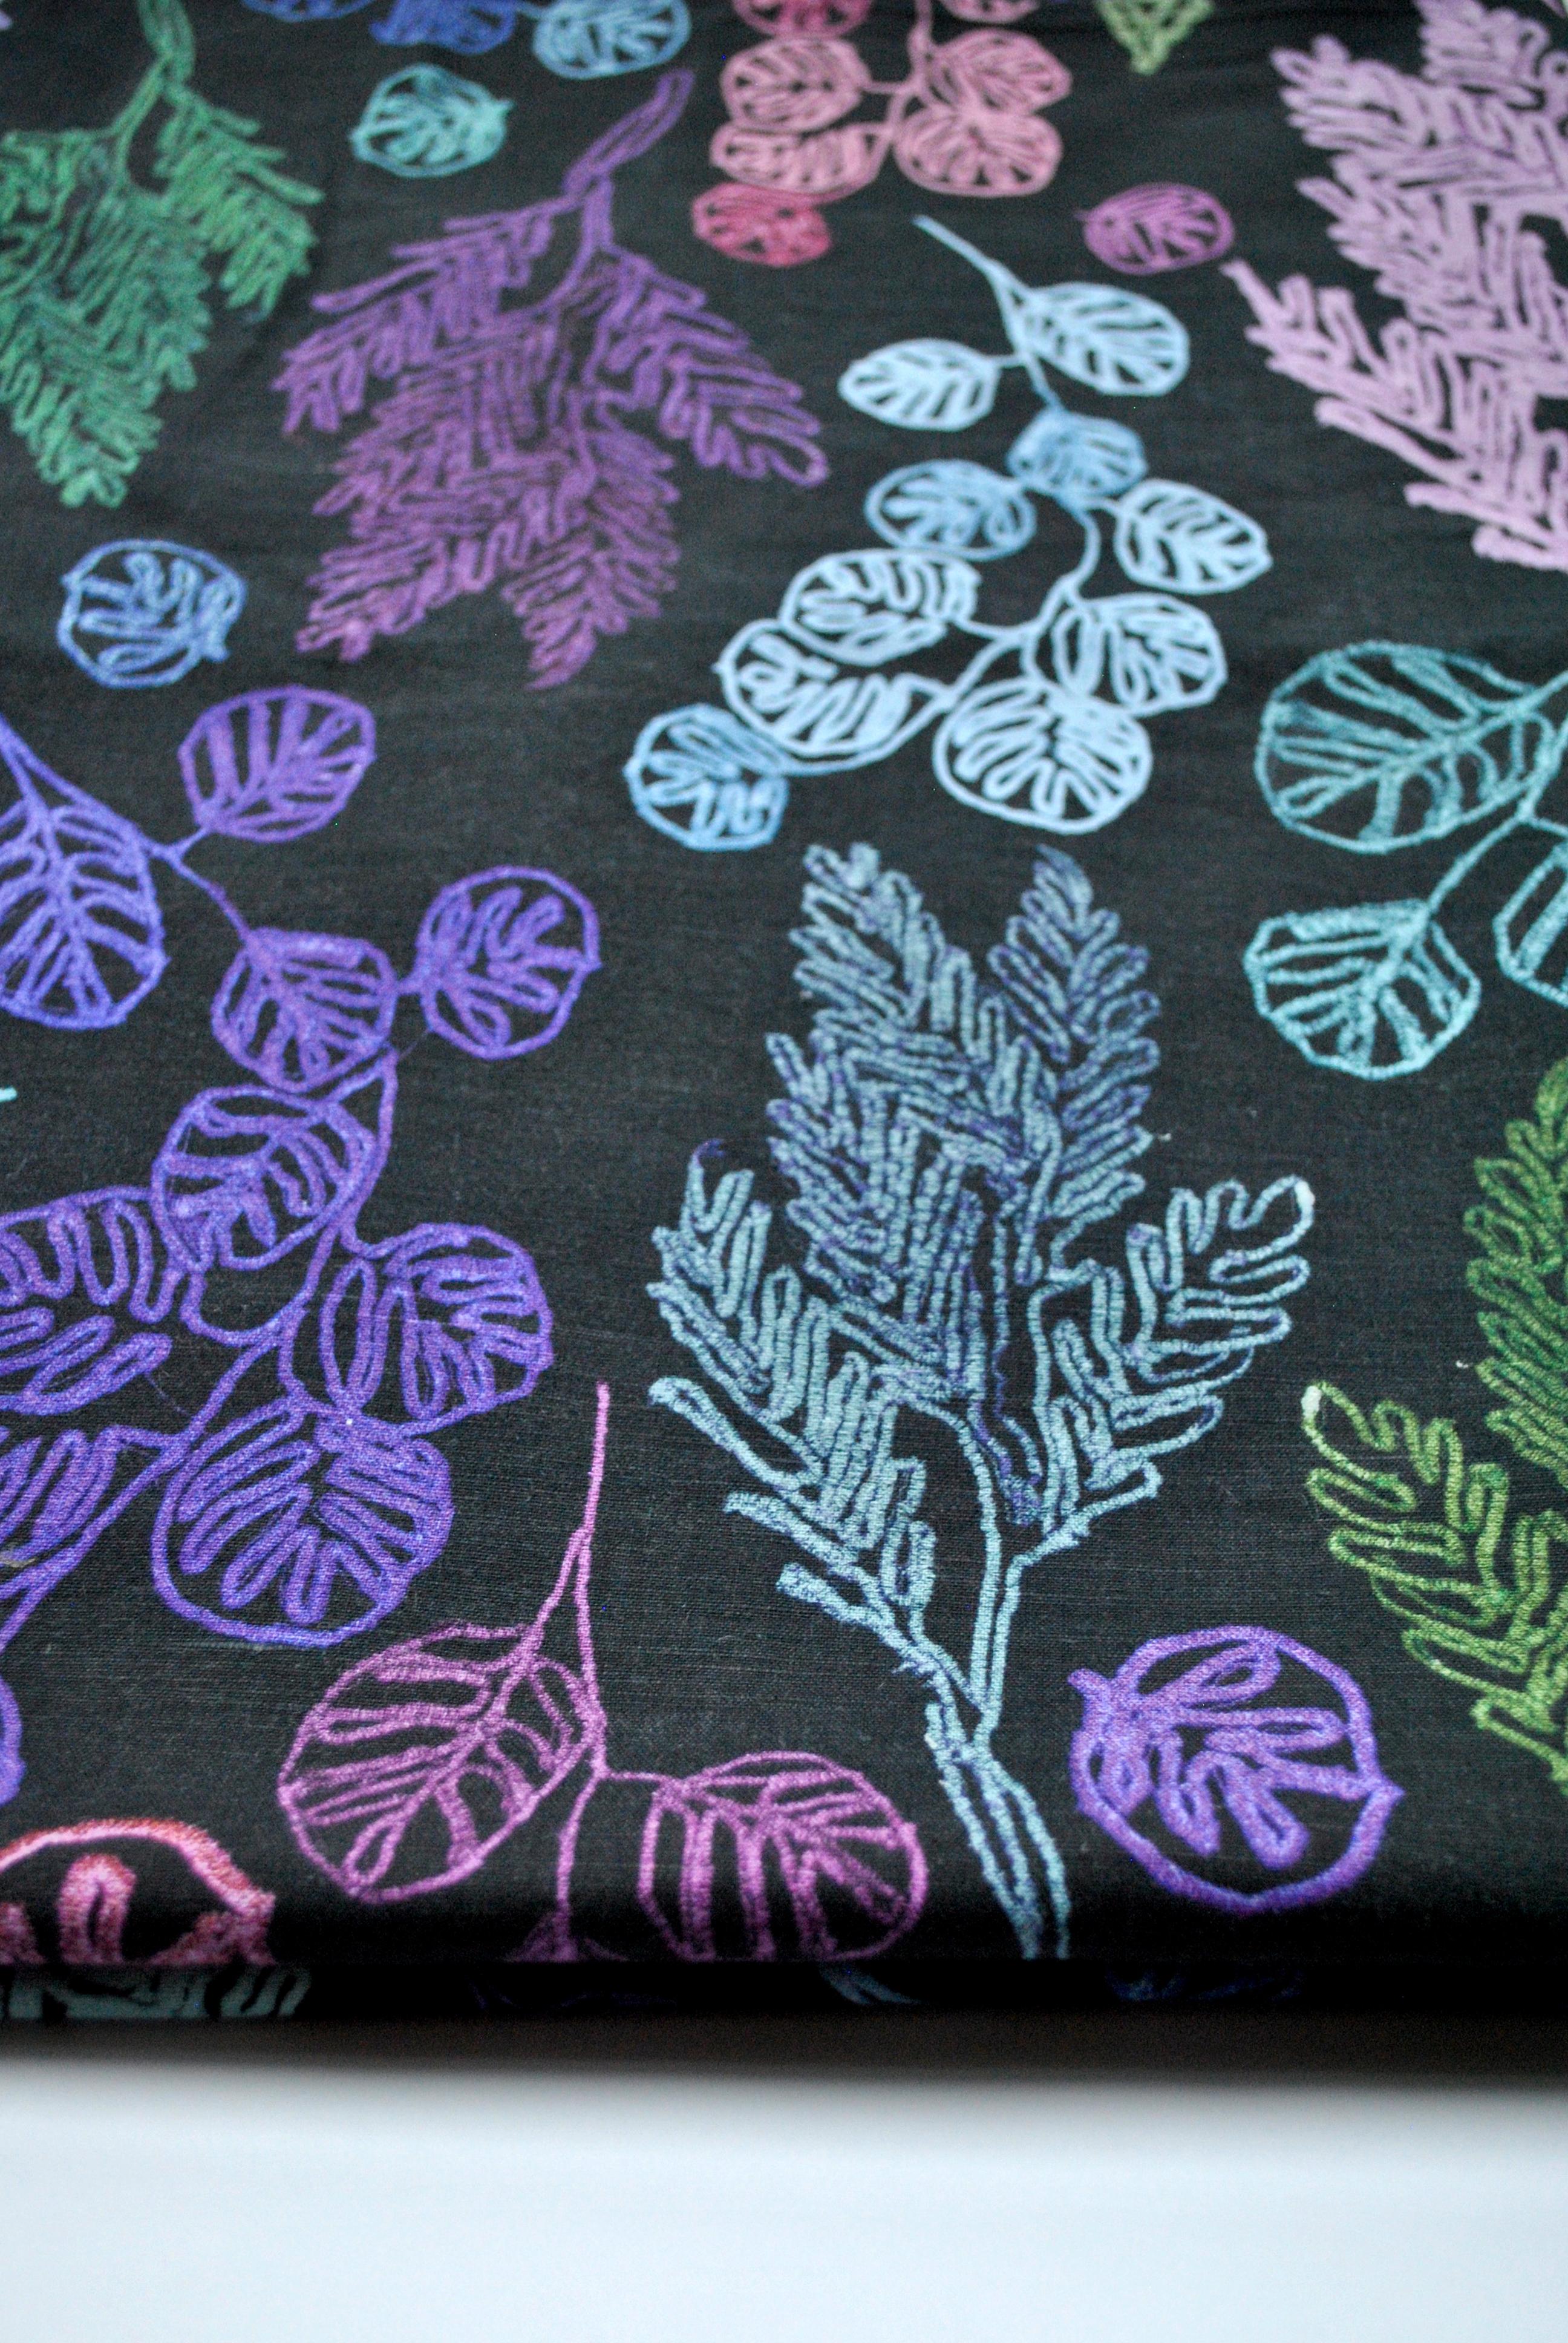 Big Pastel Branches: Linen Cotton Fabric